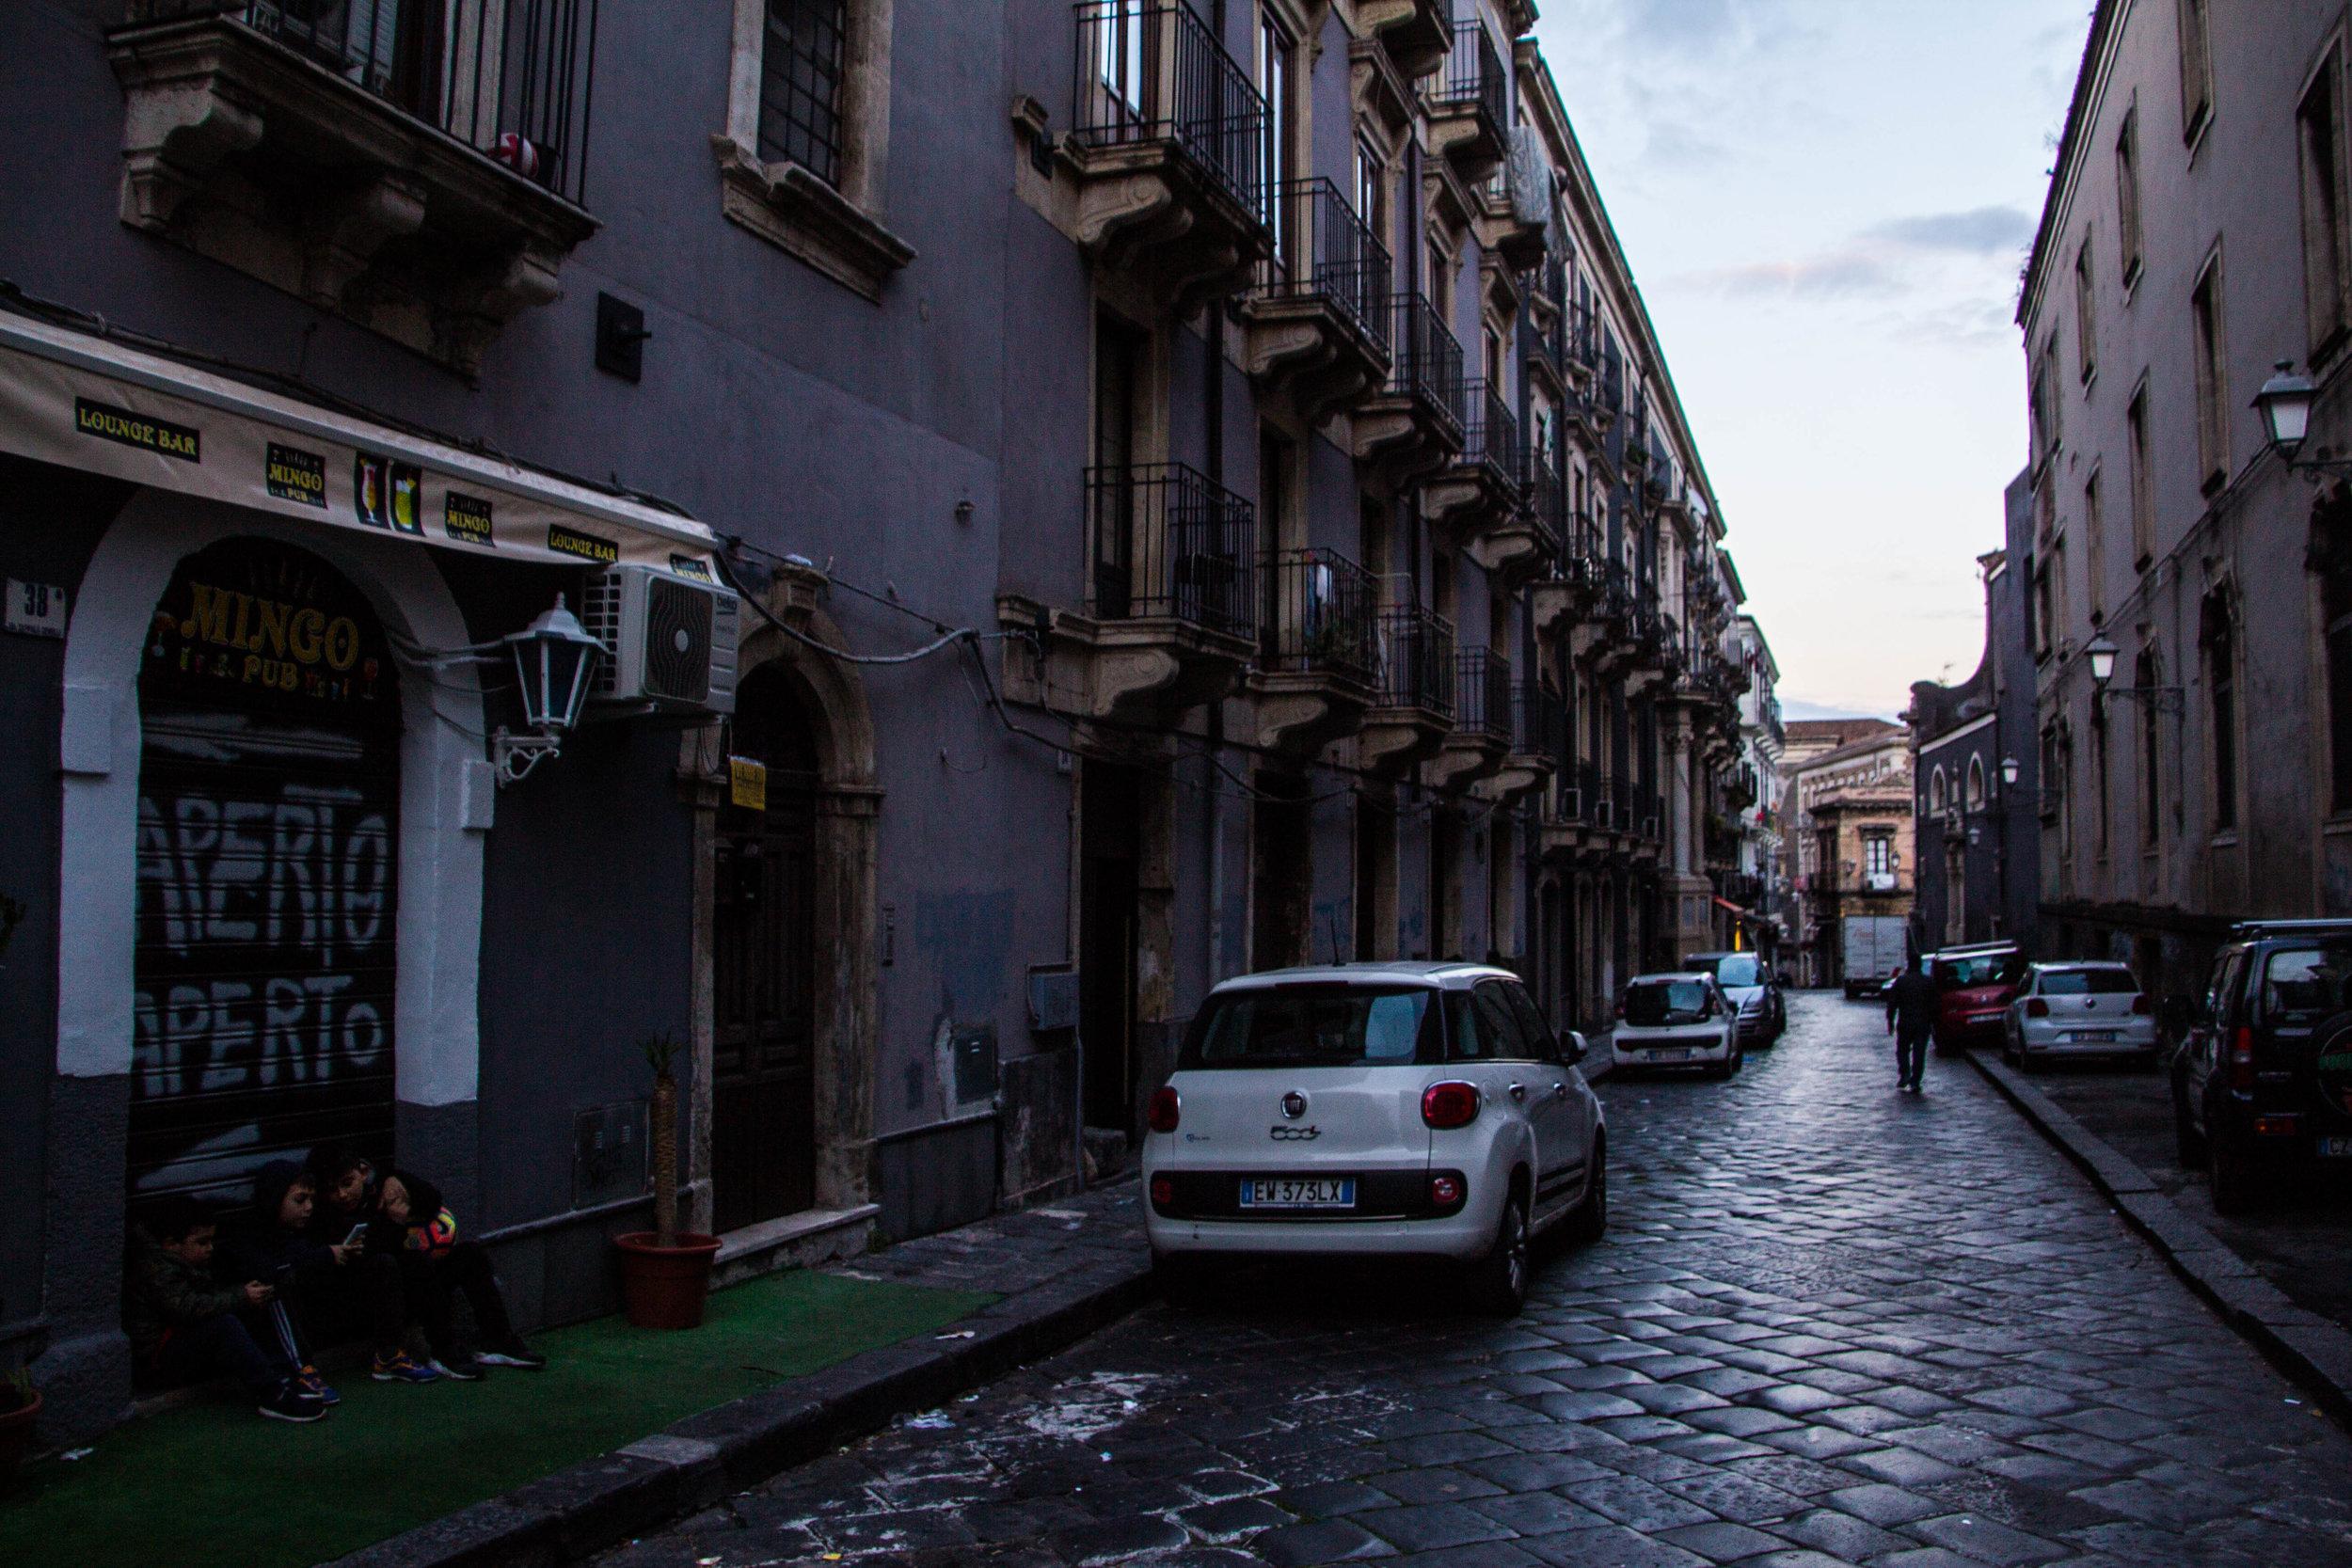 streets-catania-sicily-sicilia-34.jpg